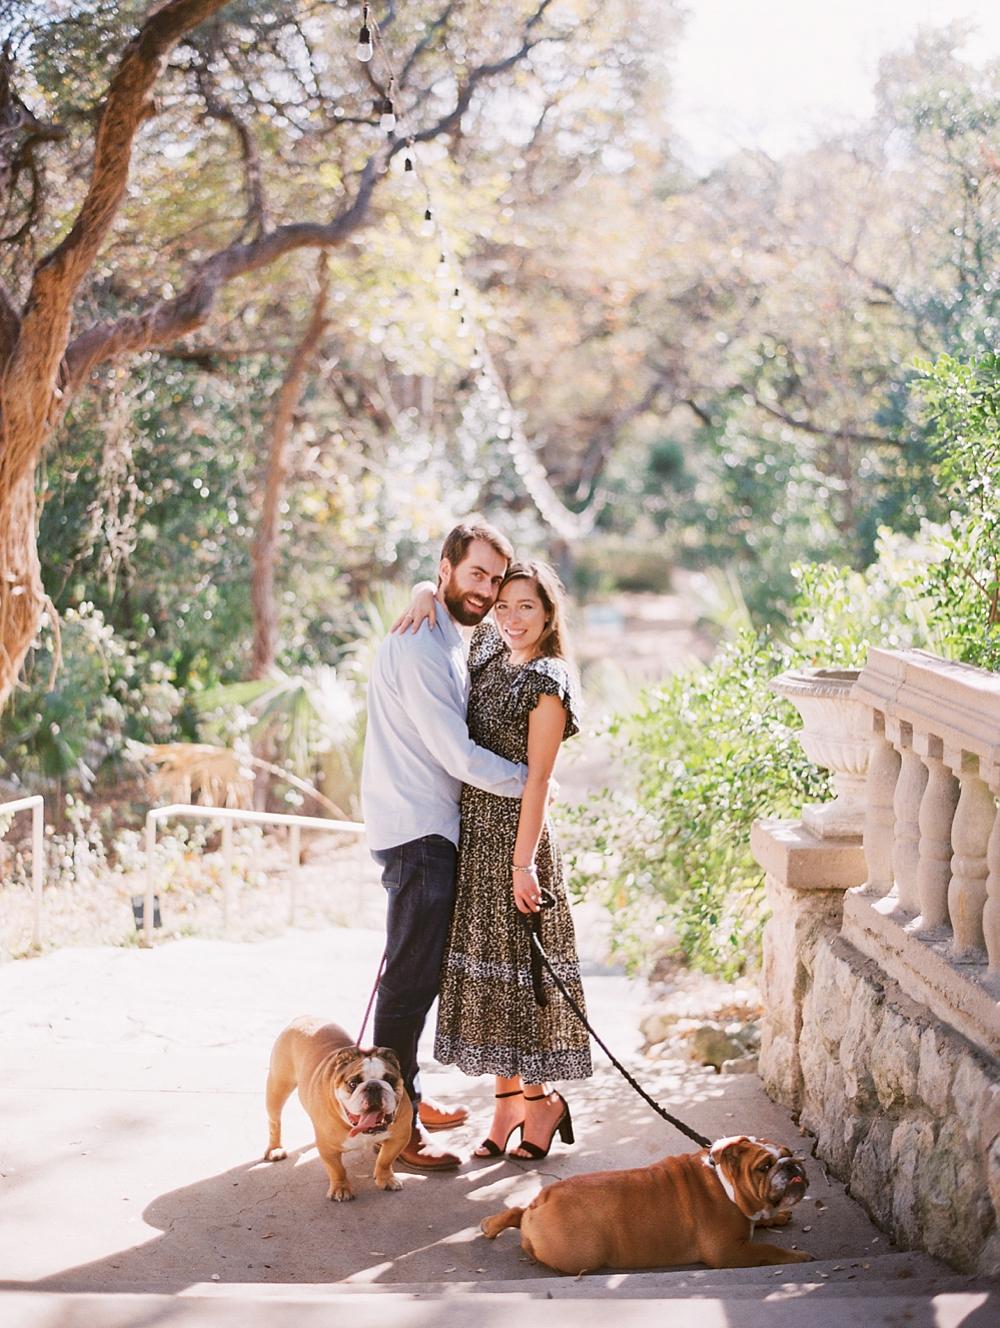 kristin-la-voie-photography-Austin-Wedding-Photographer-laguna-gloria-commodore-perry-estate-engagement-18